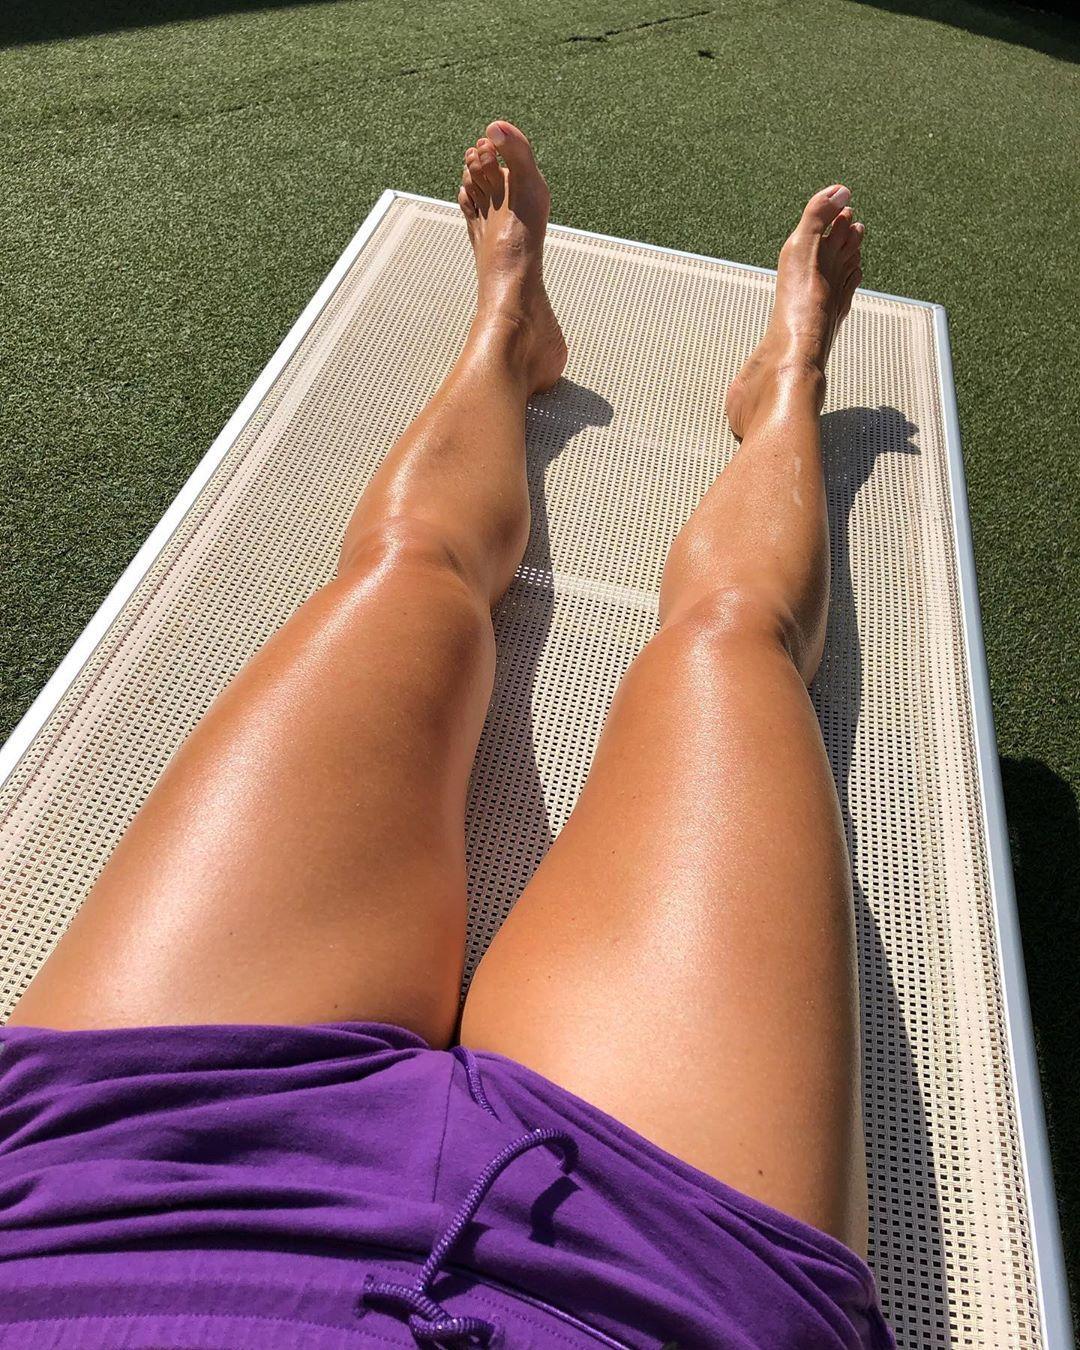 September...Sun and relax☀️😎 #september #sun #relax #legs #violet #feelinggood #sunday #sundaymood #...